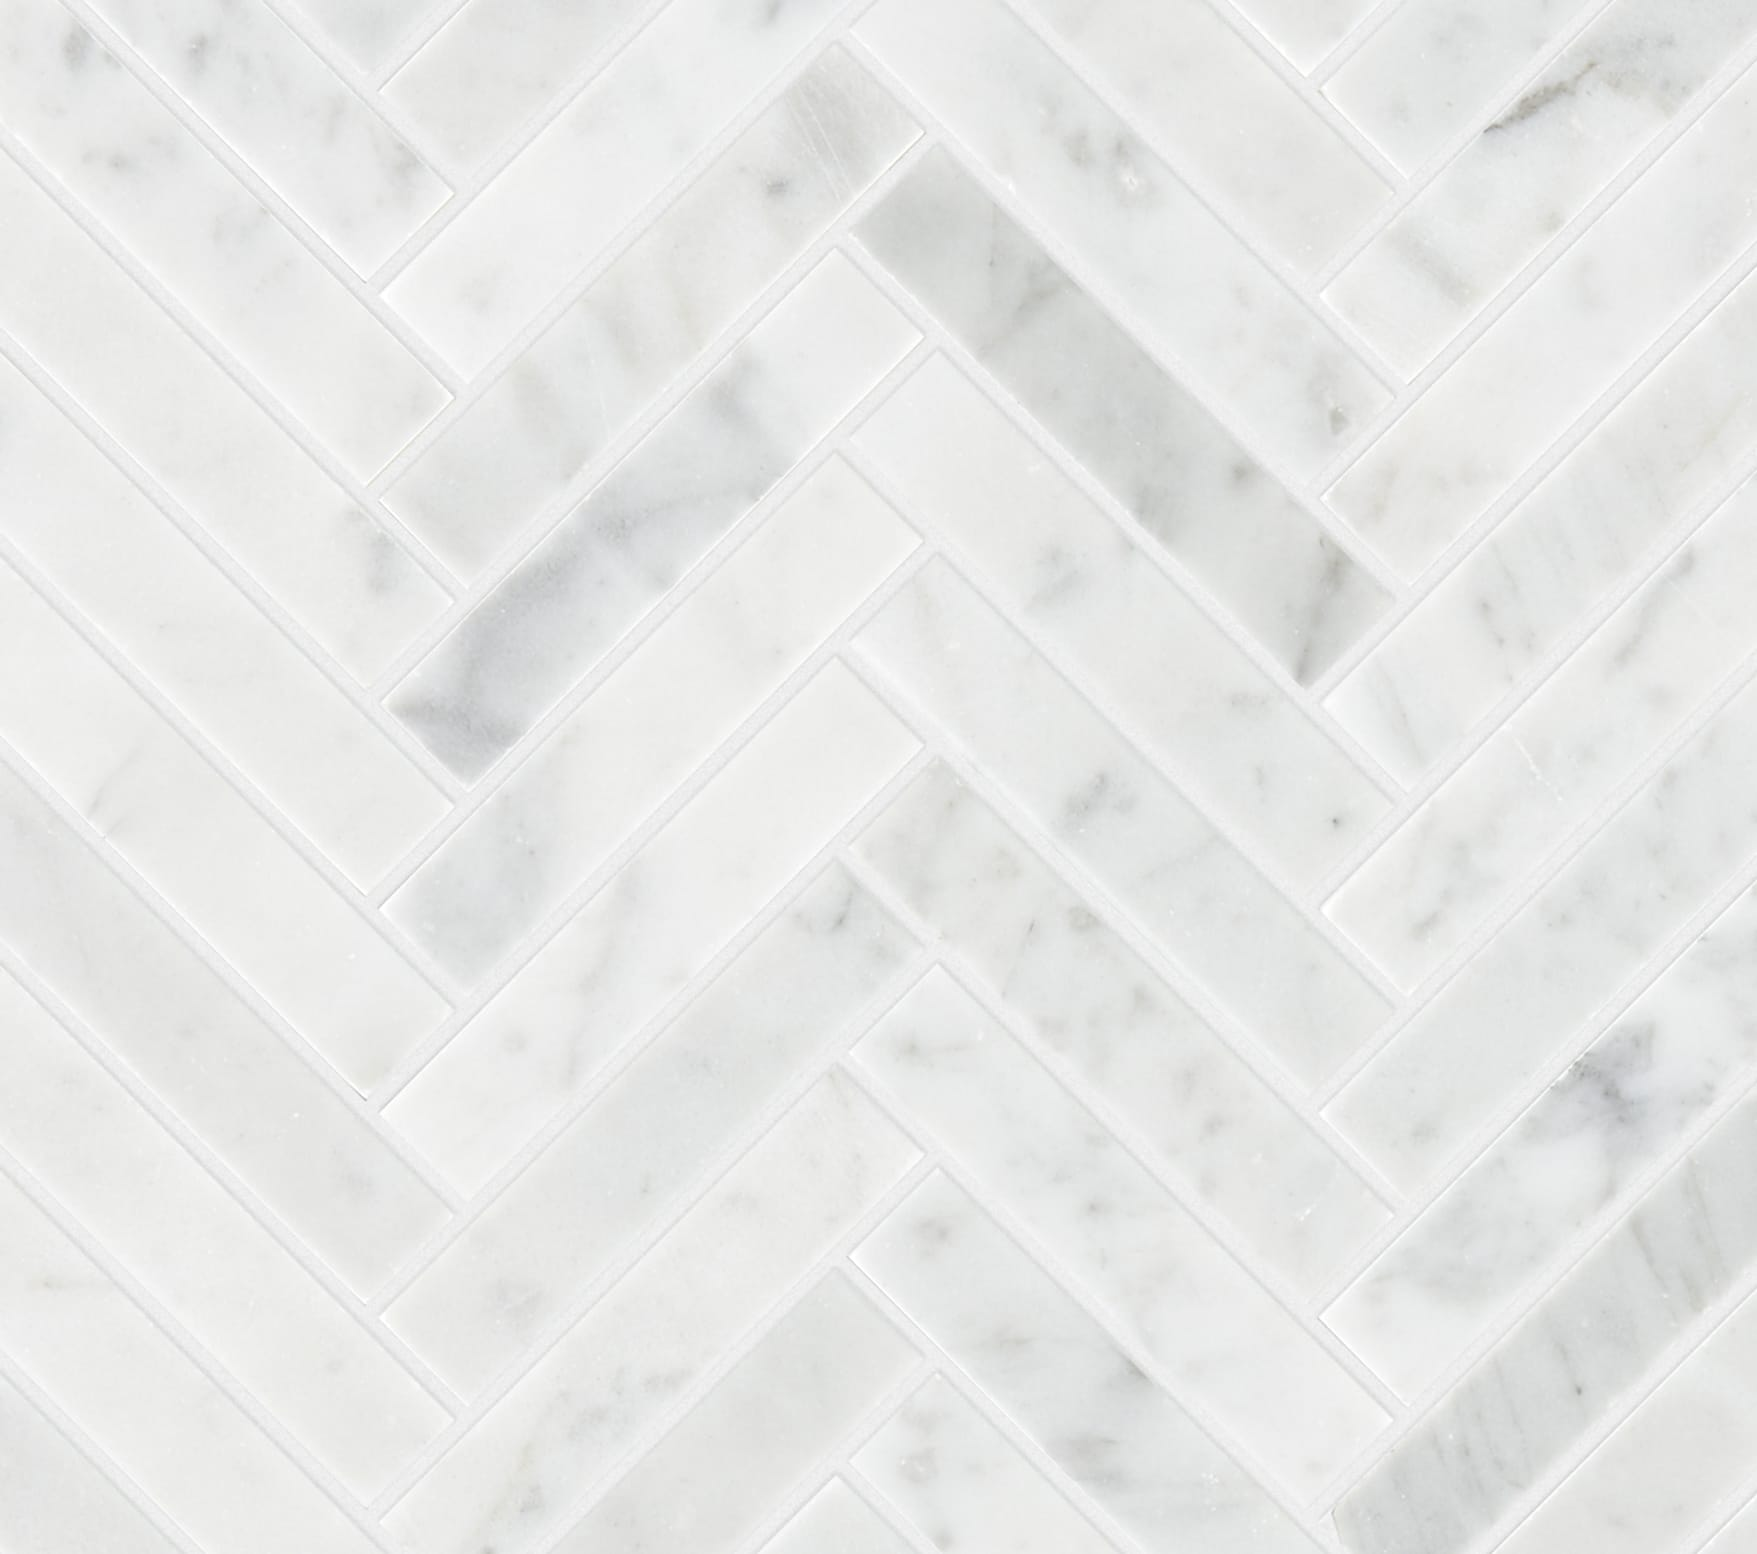 Carrara Honed Marble Herringbone Mosaic Tile